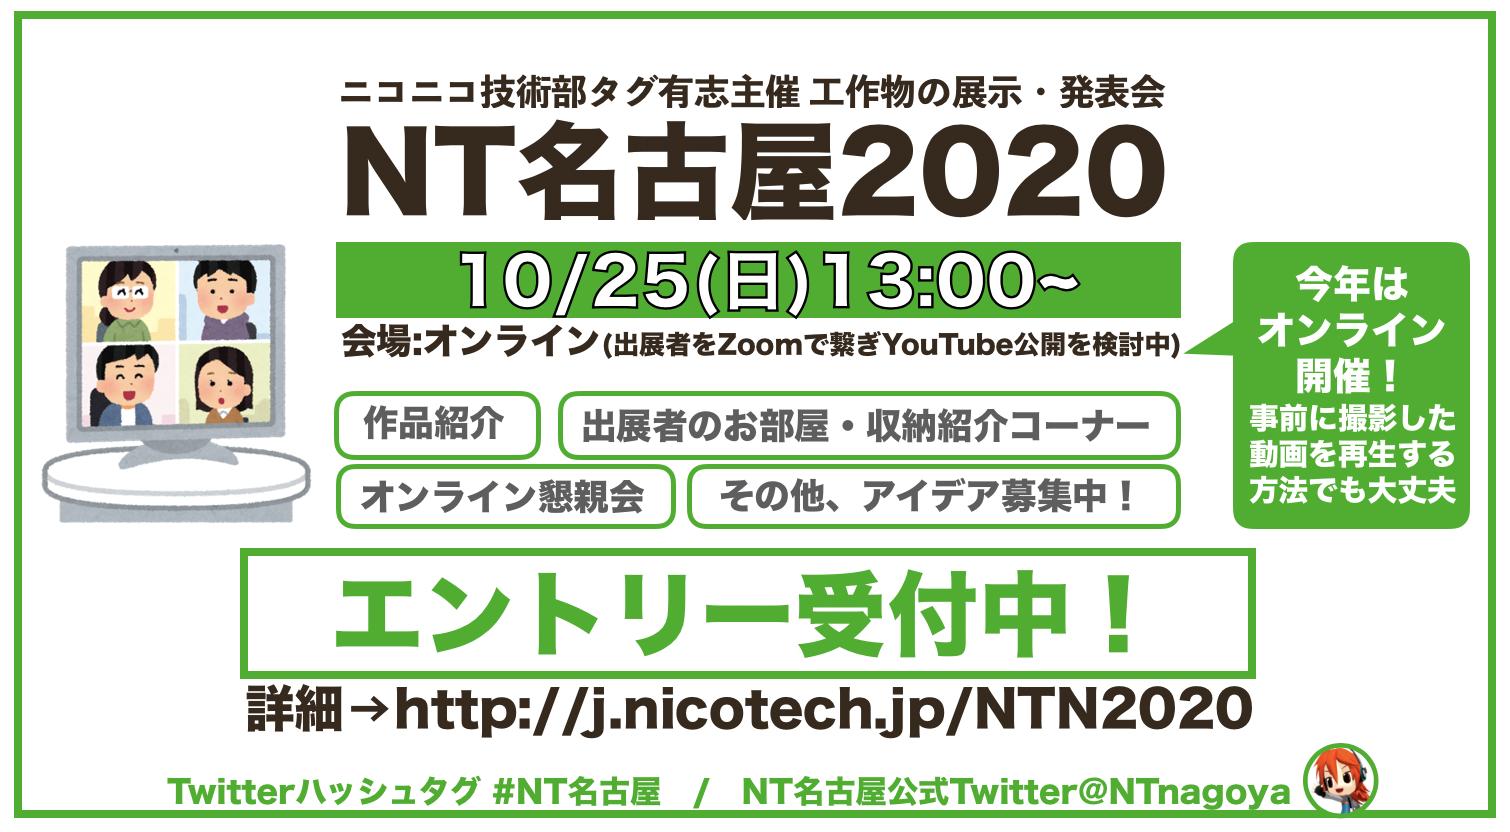 NT名古屋2020_エントリー受付中.png